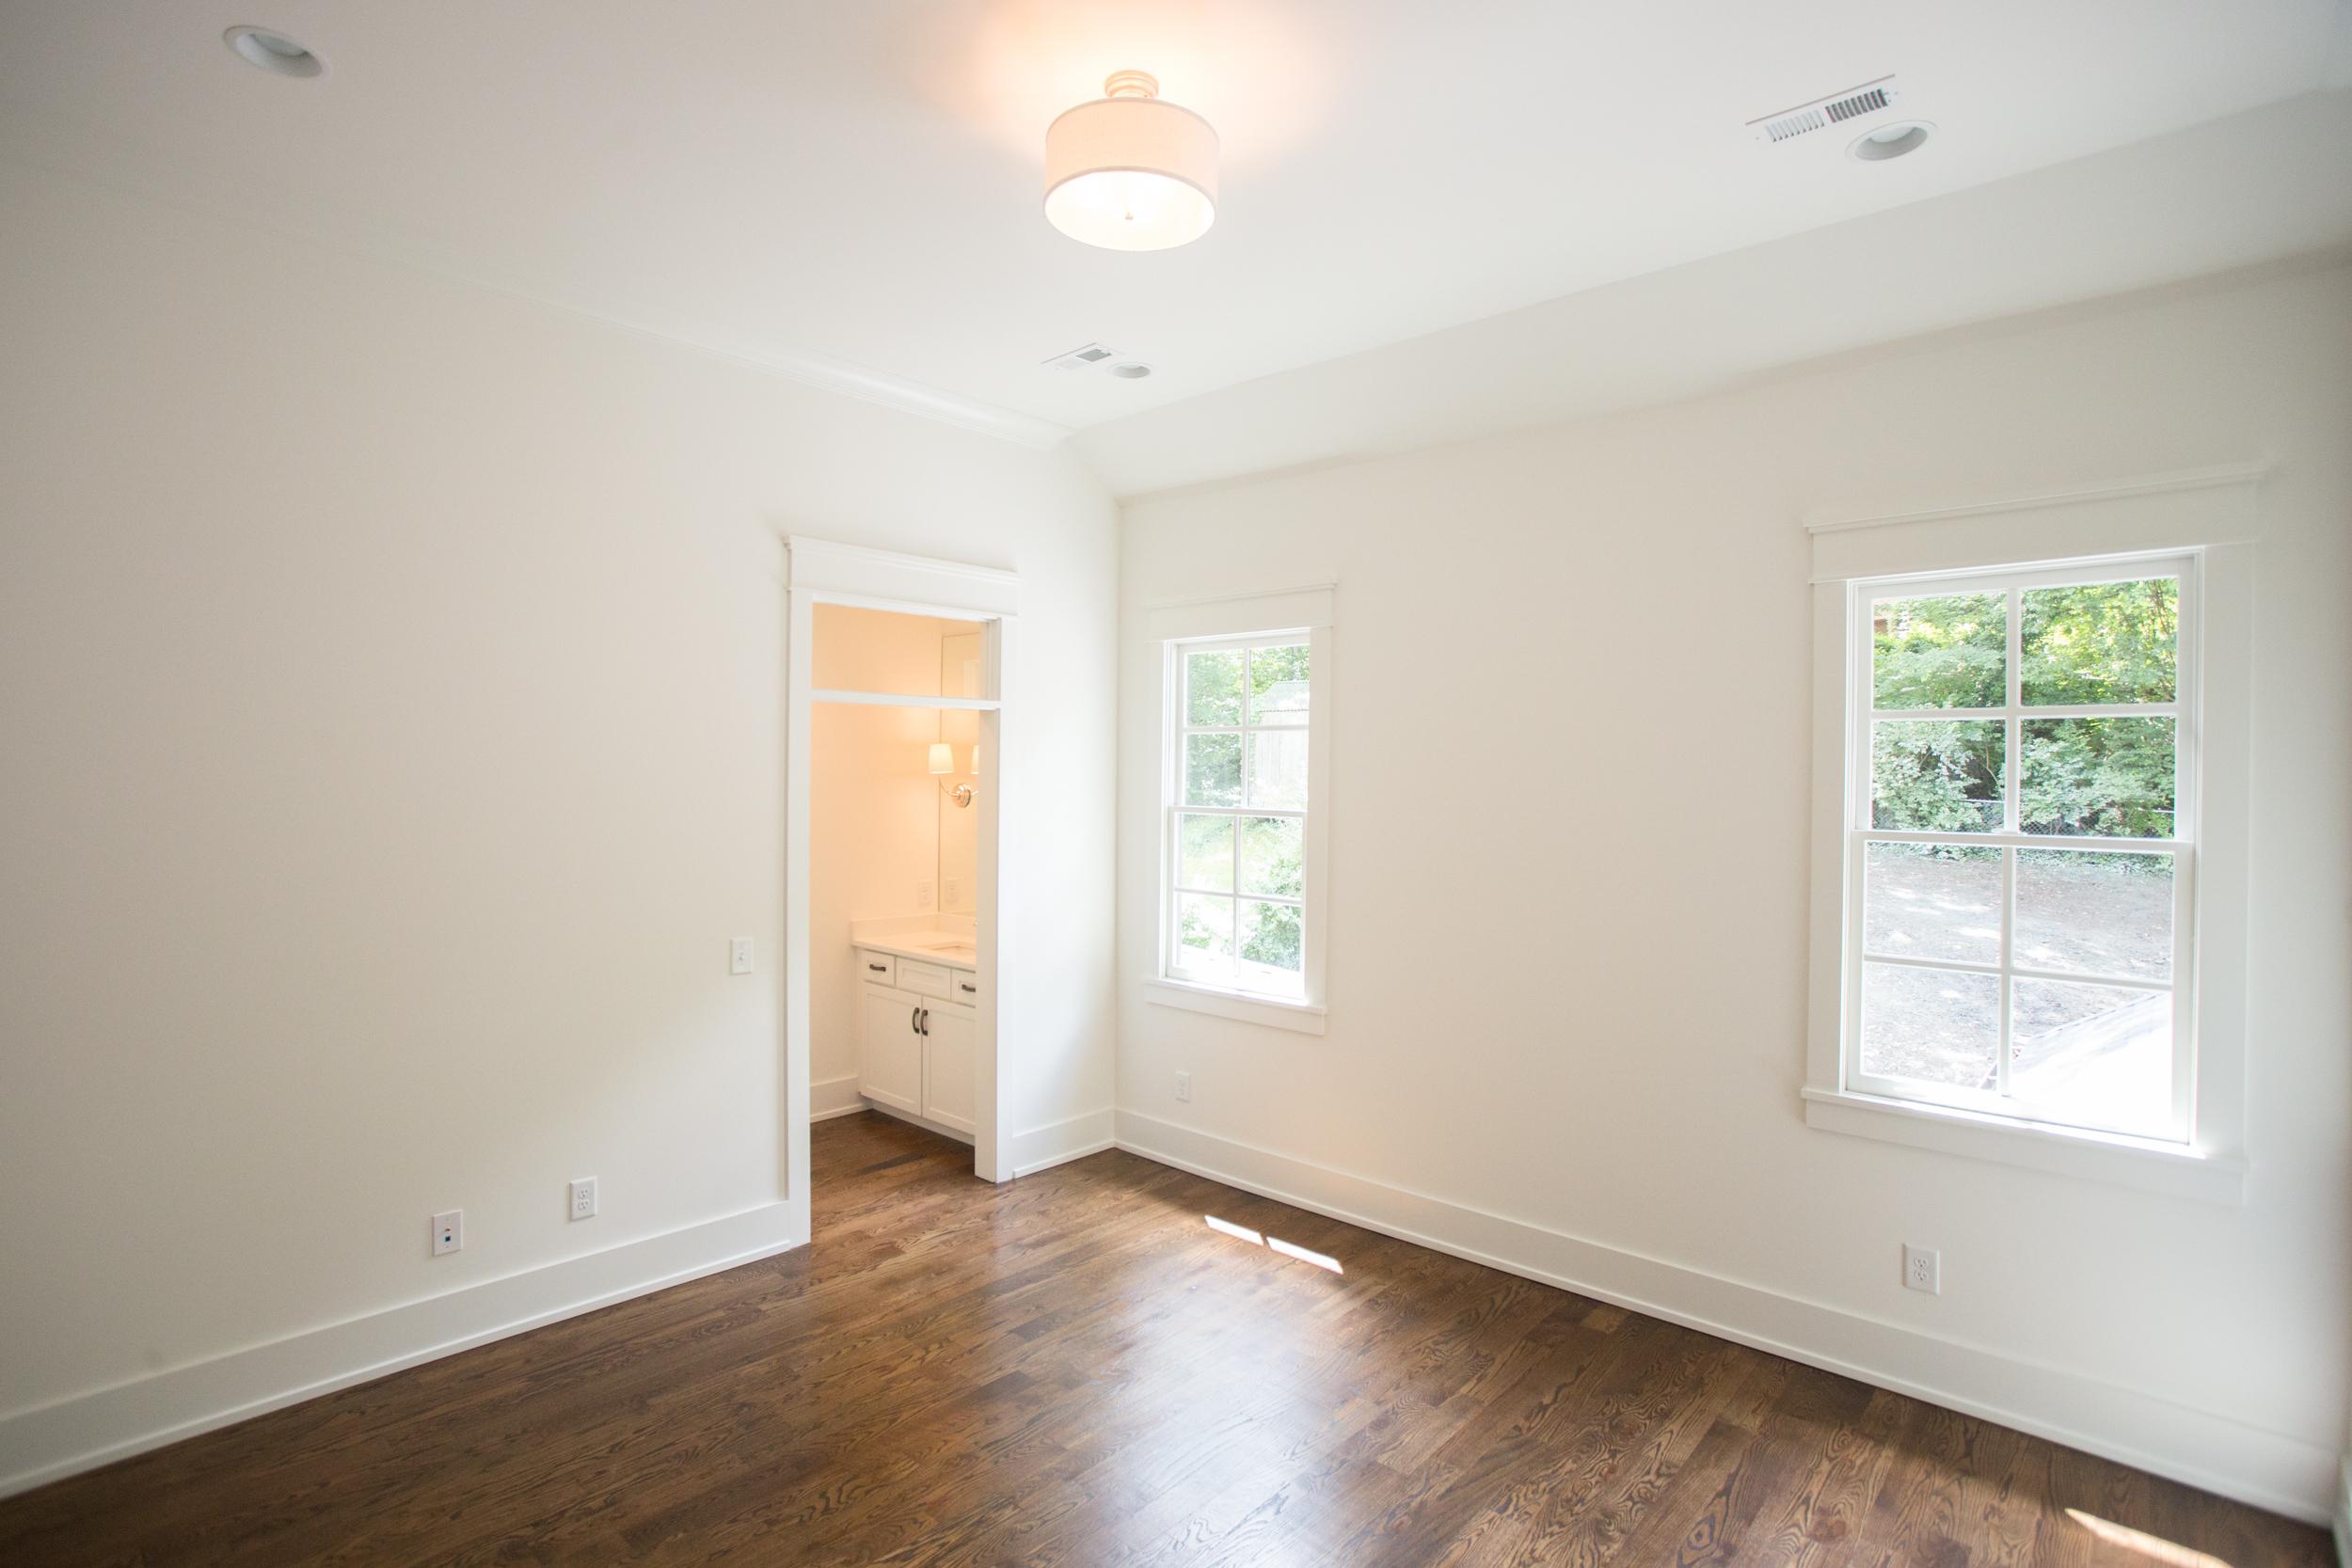 new-construction-nashville-custom-built-home-britt-development-group-7330.jpg